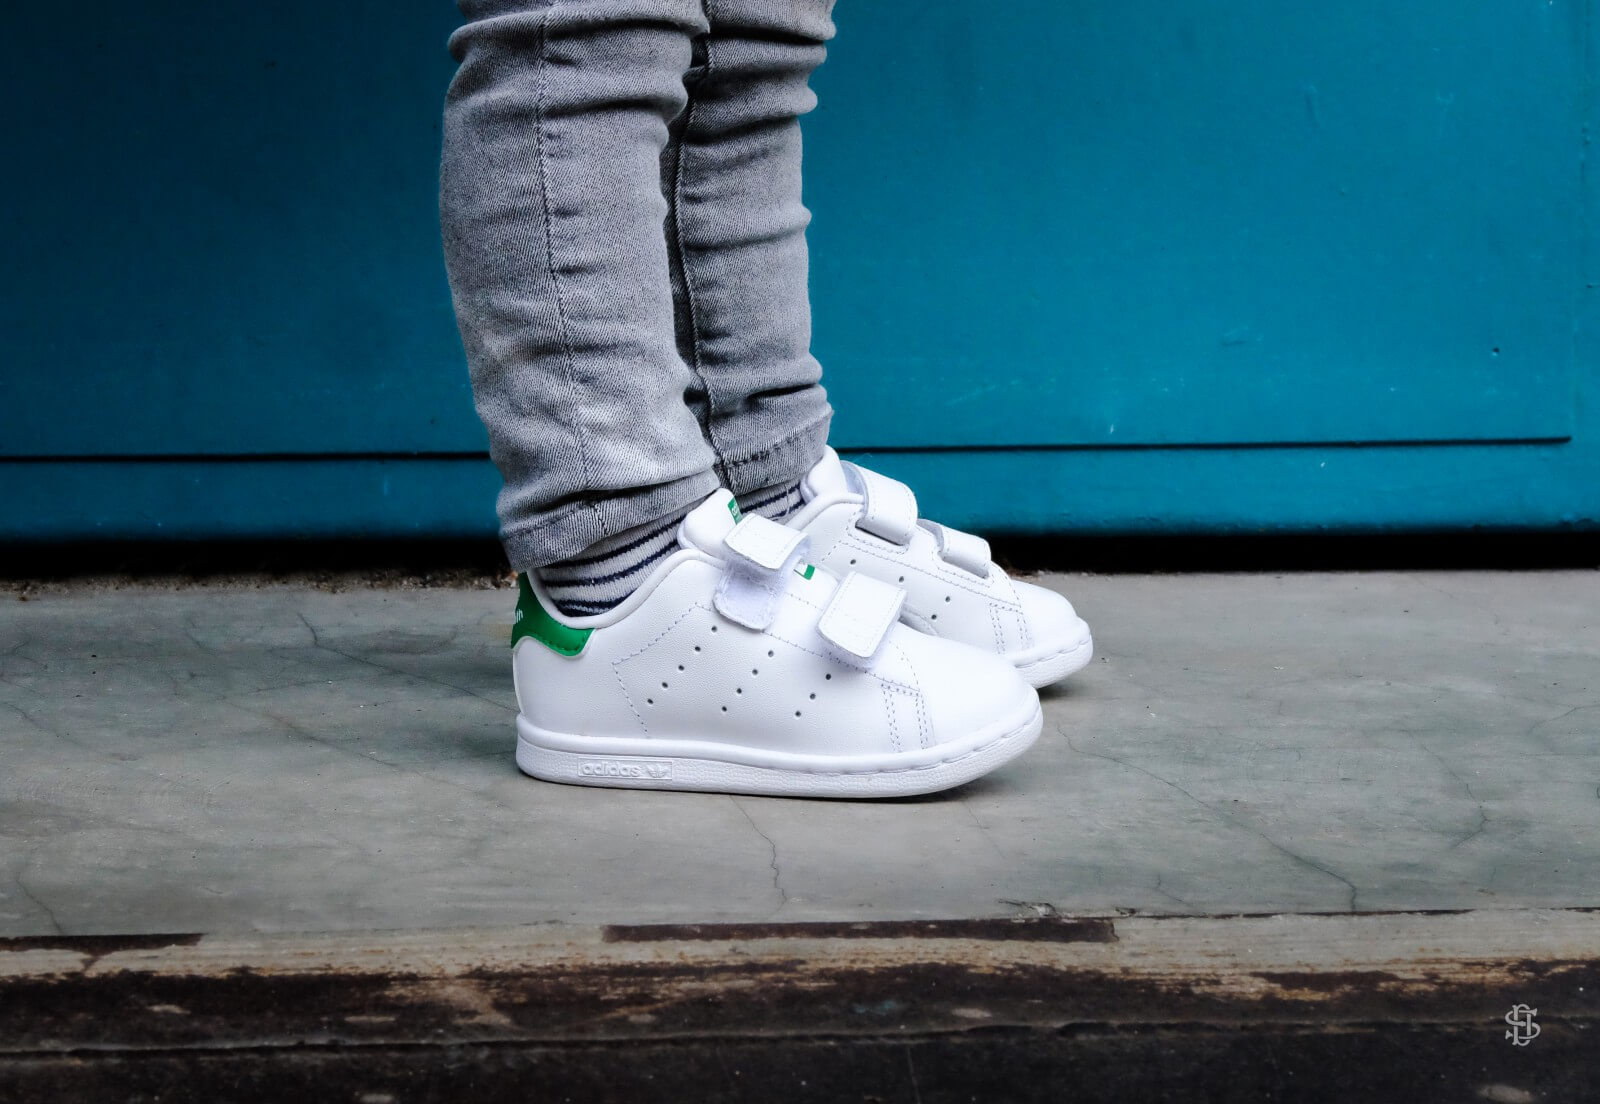 Adidas Stan Smith CF Infant Footwear White Green M20609